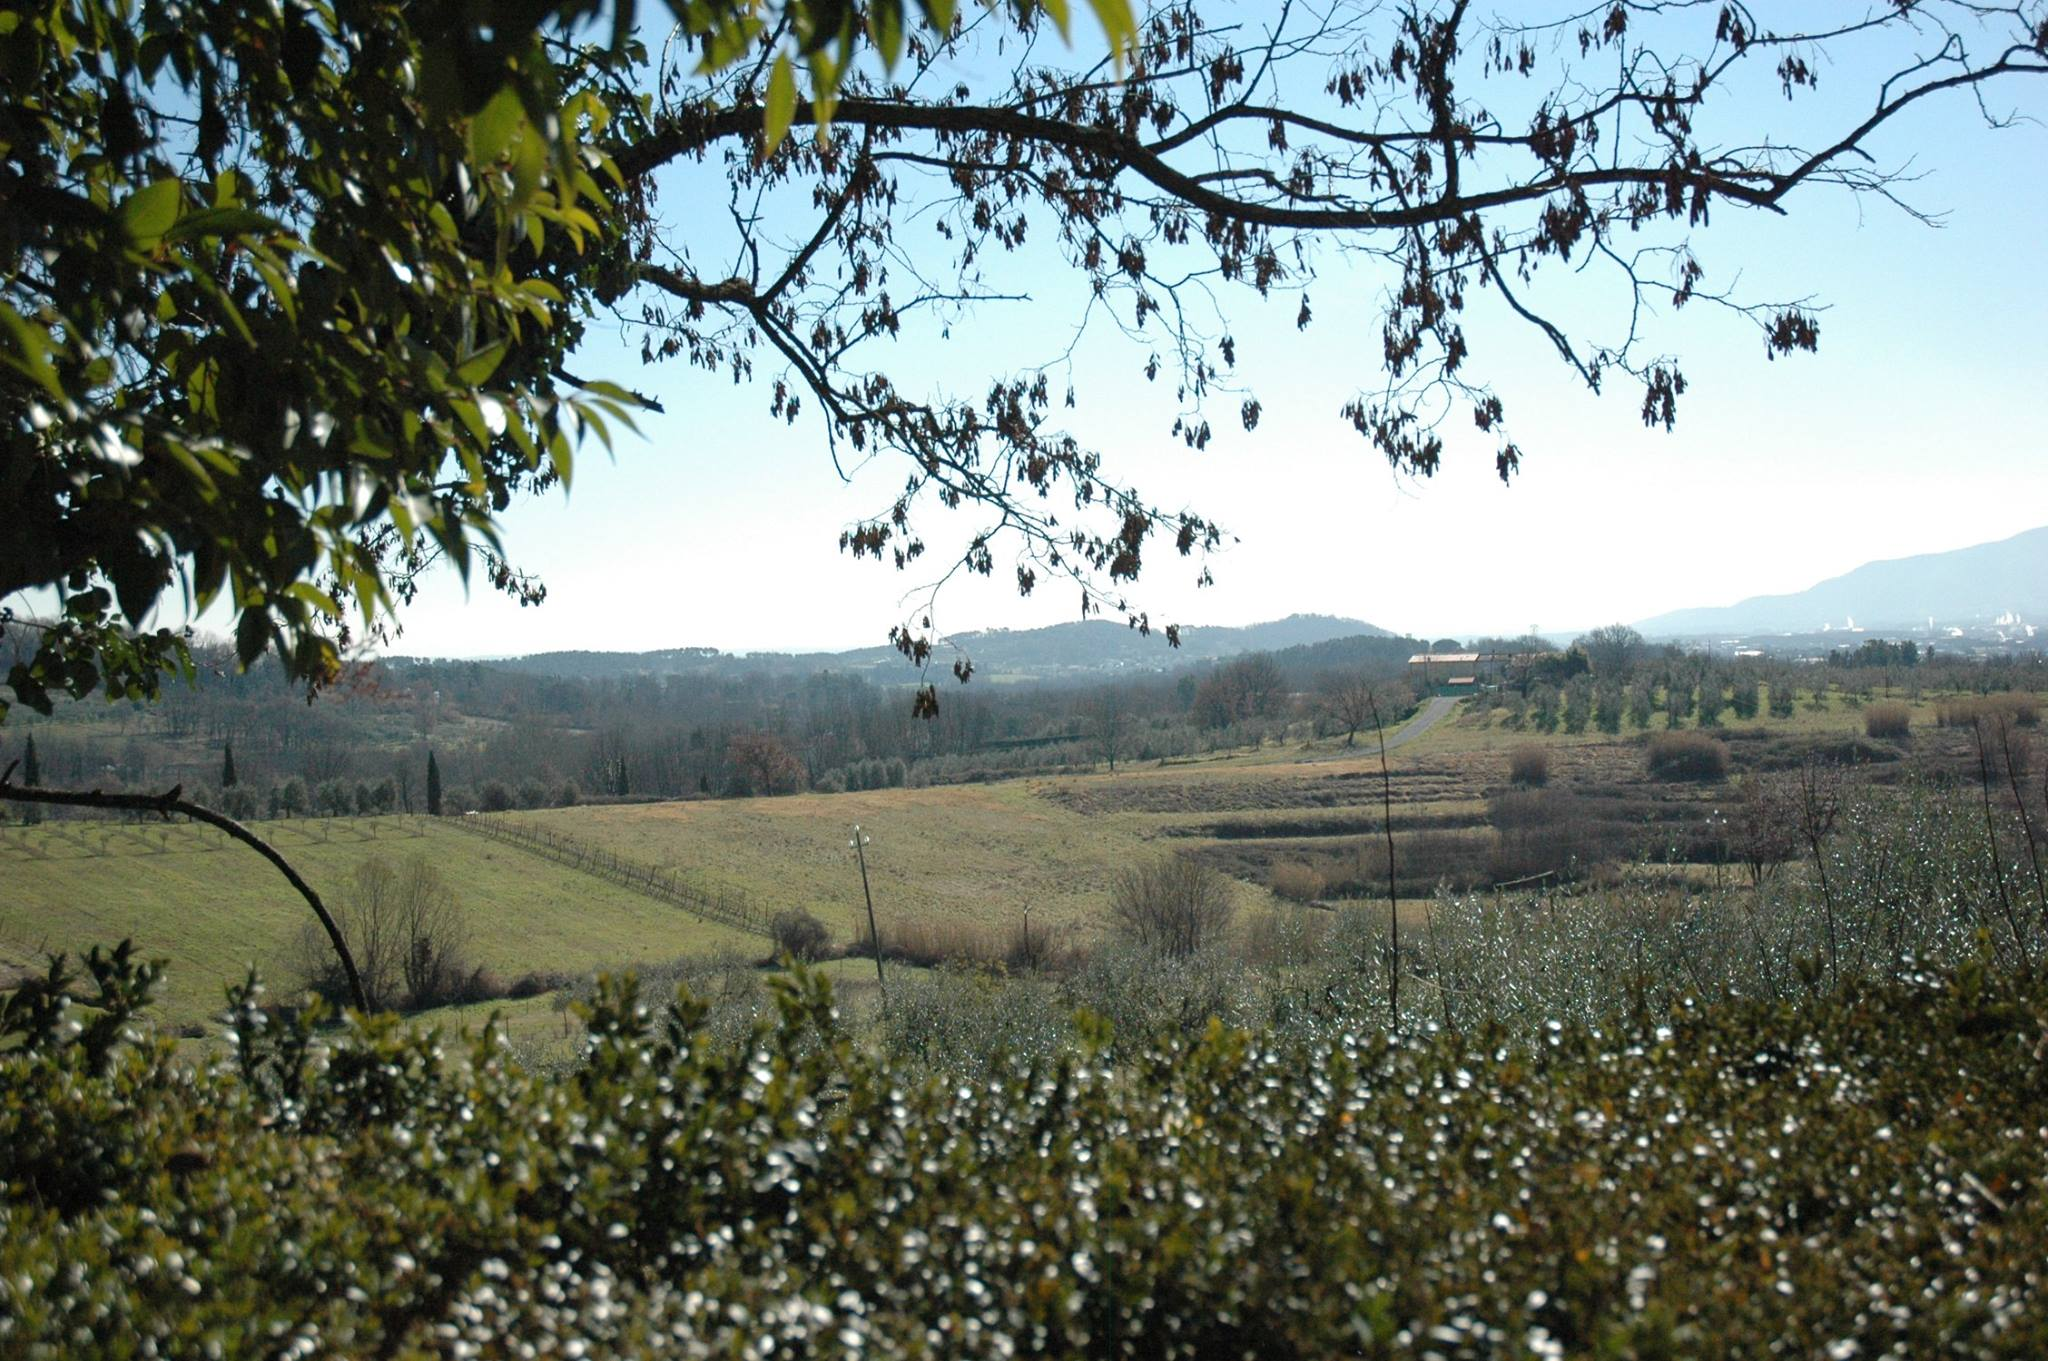 borghi del vino toscana